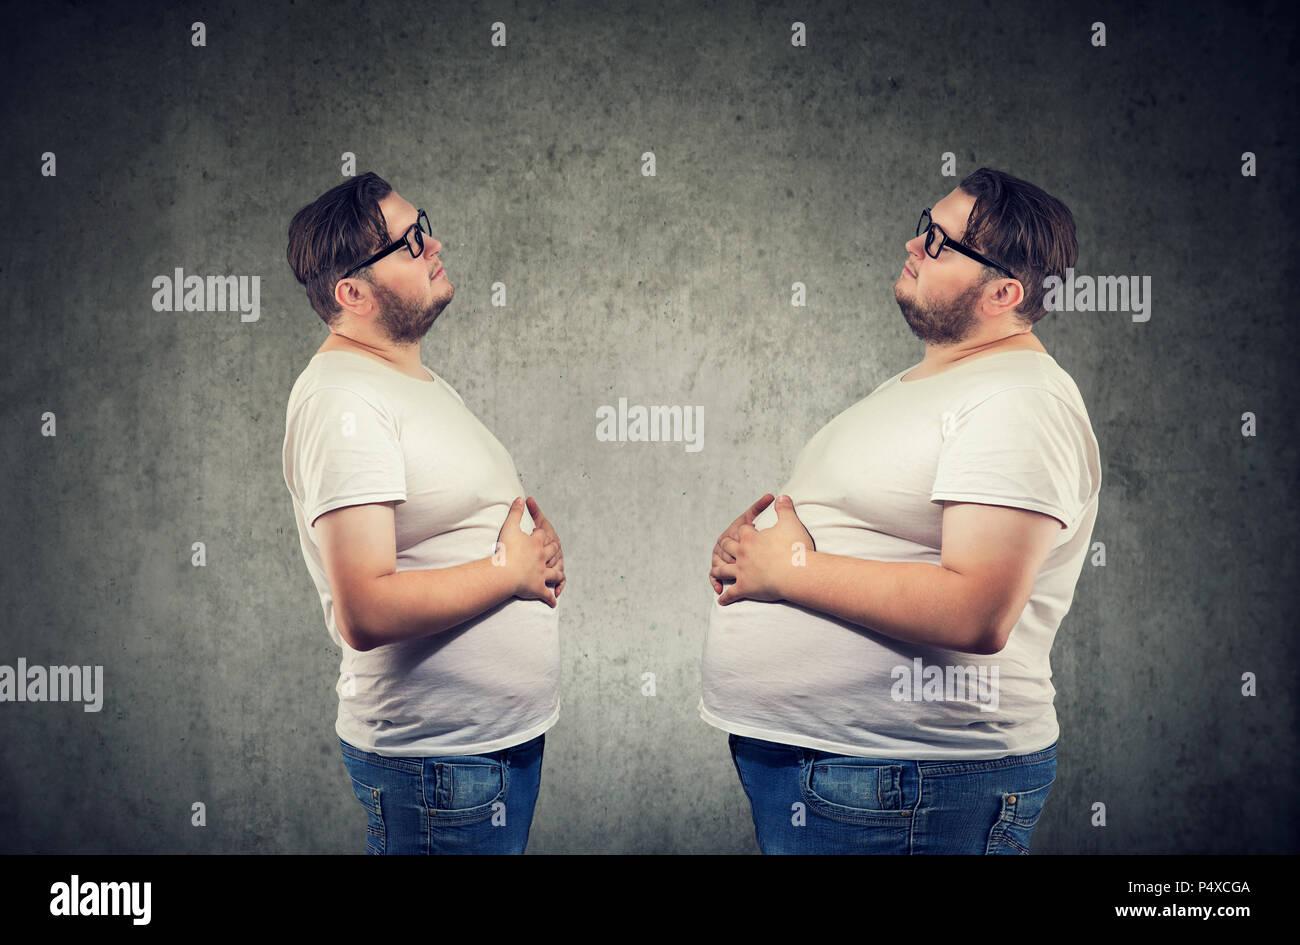 Junge mollig Mann an der fetten selbst Völlegefühl. Diät und Ernährung die Wahl gesunder Lebensstil Konzept Stockbild